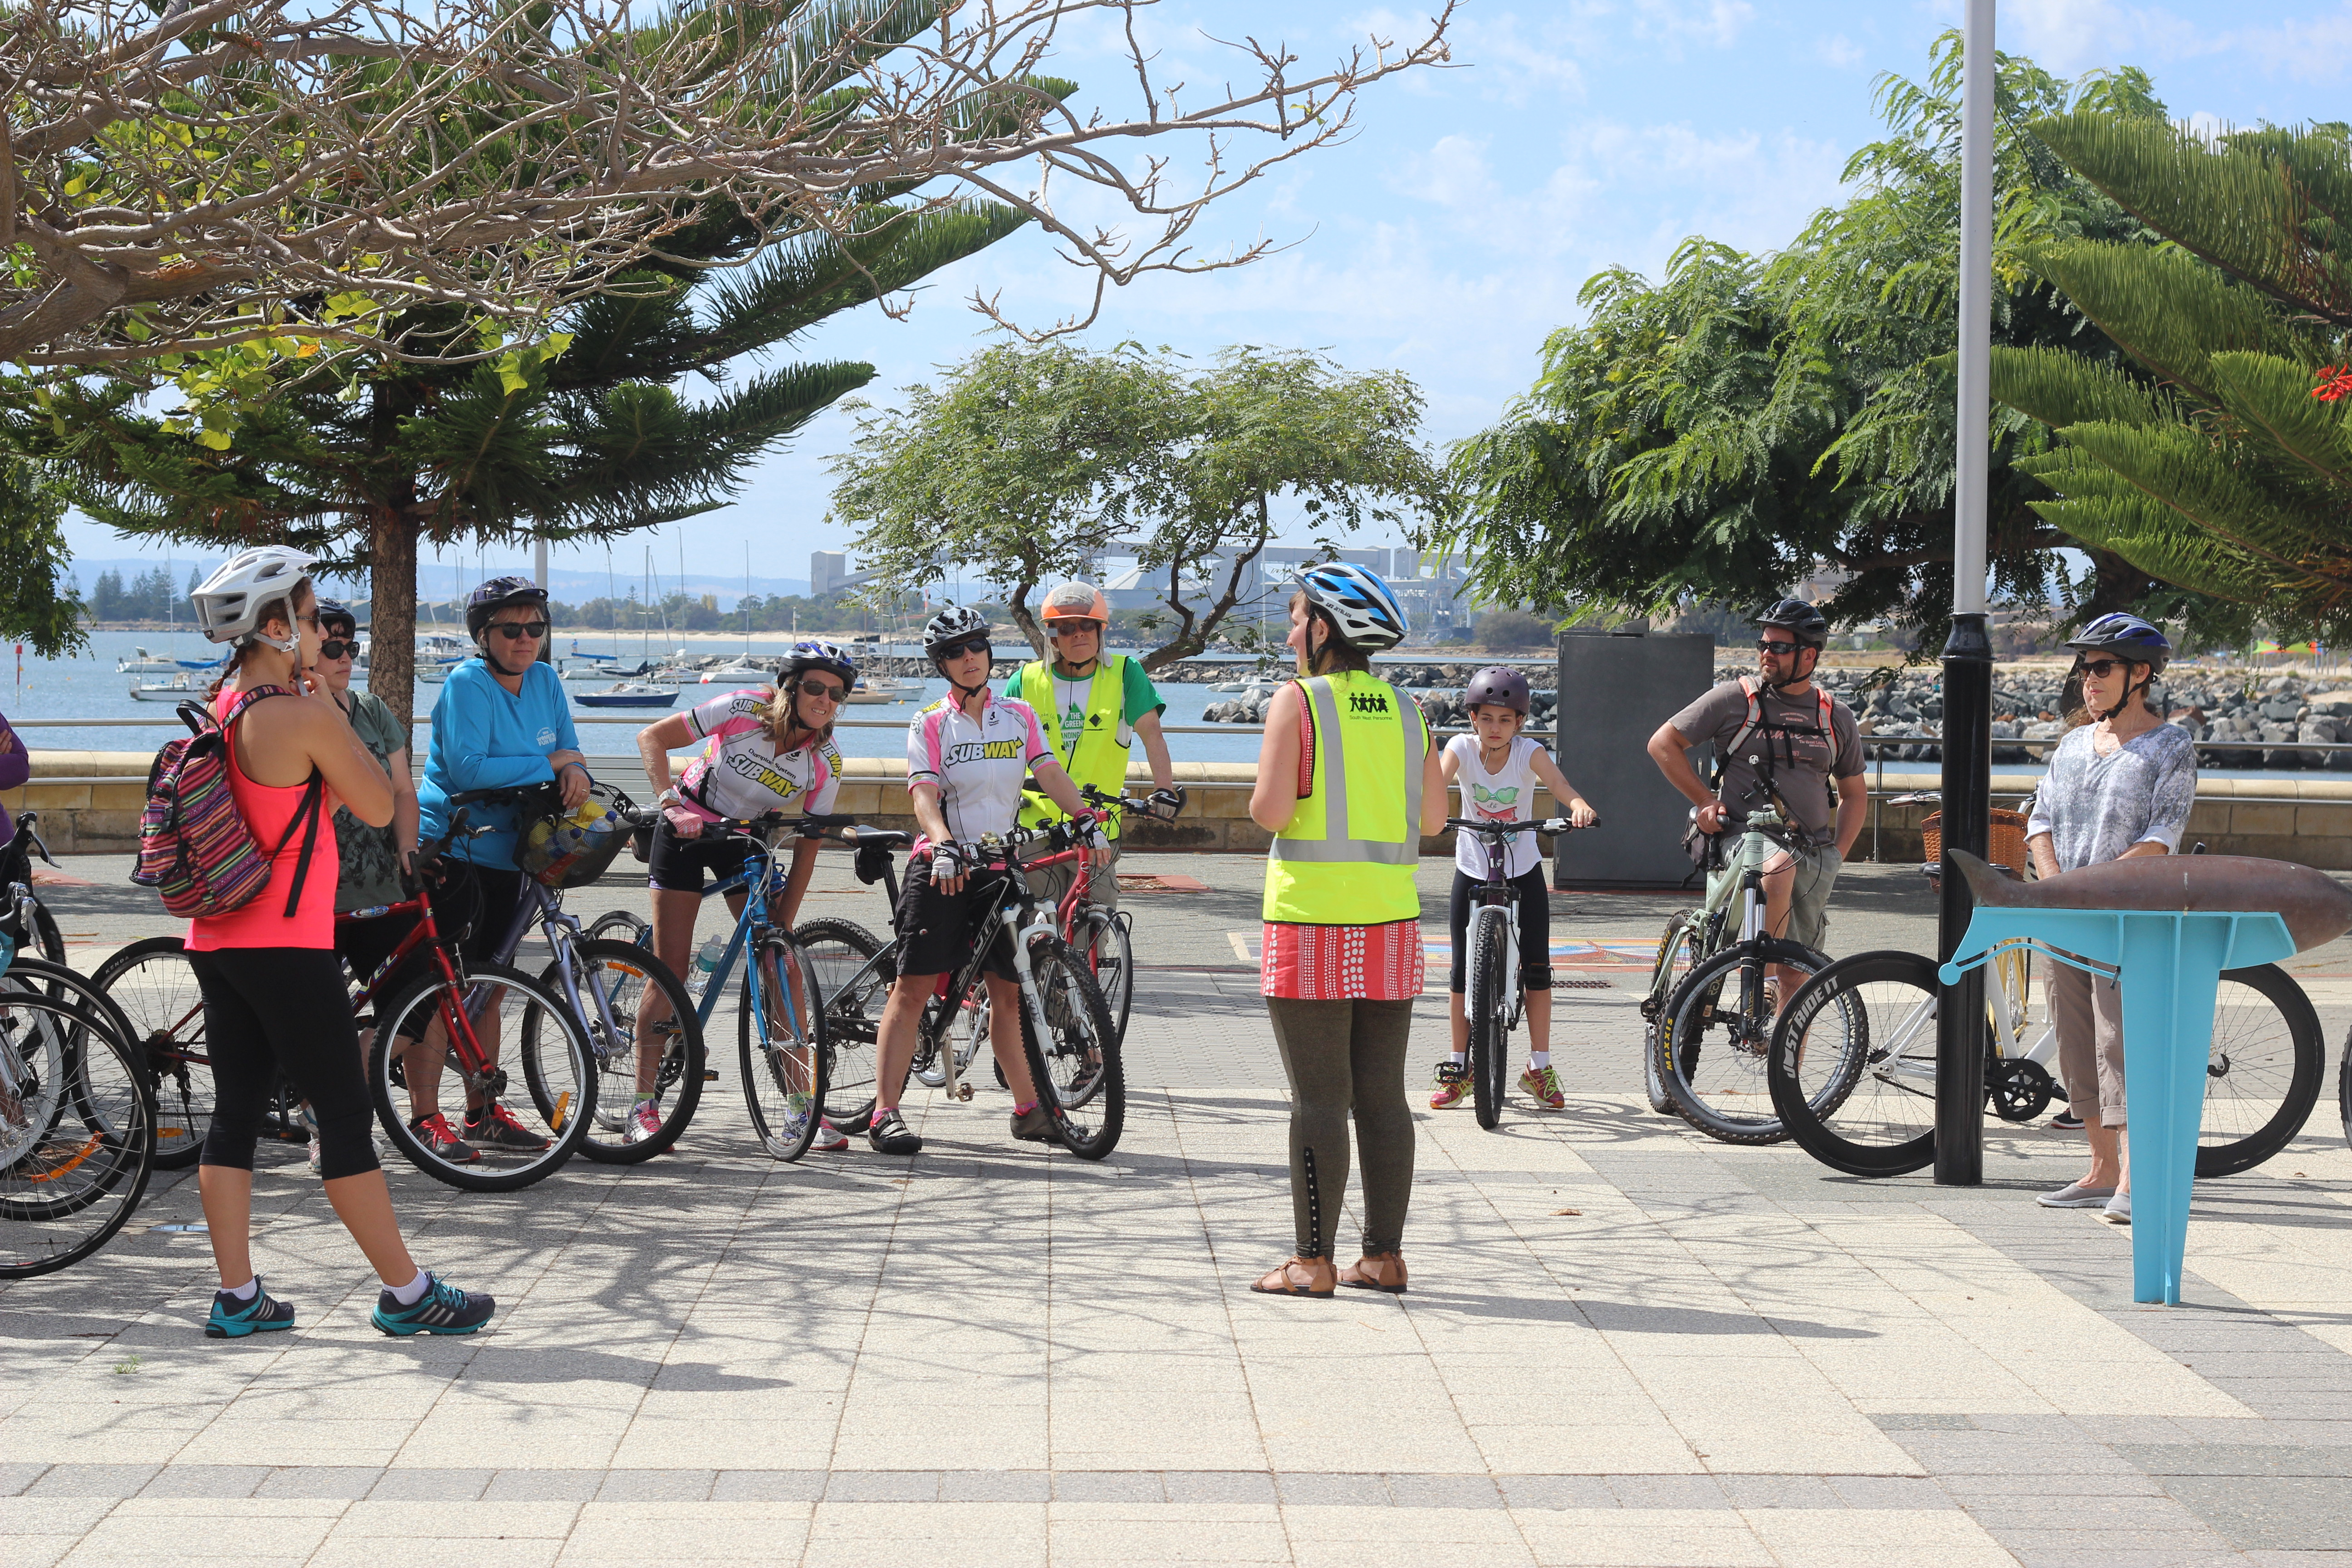 BSS: Public Art Bike Tour